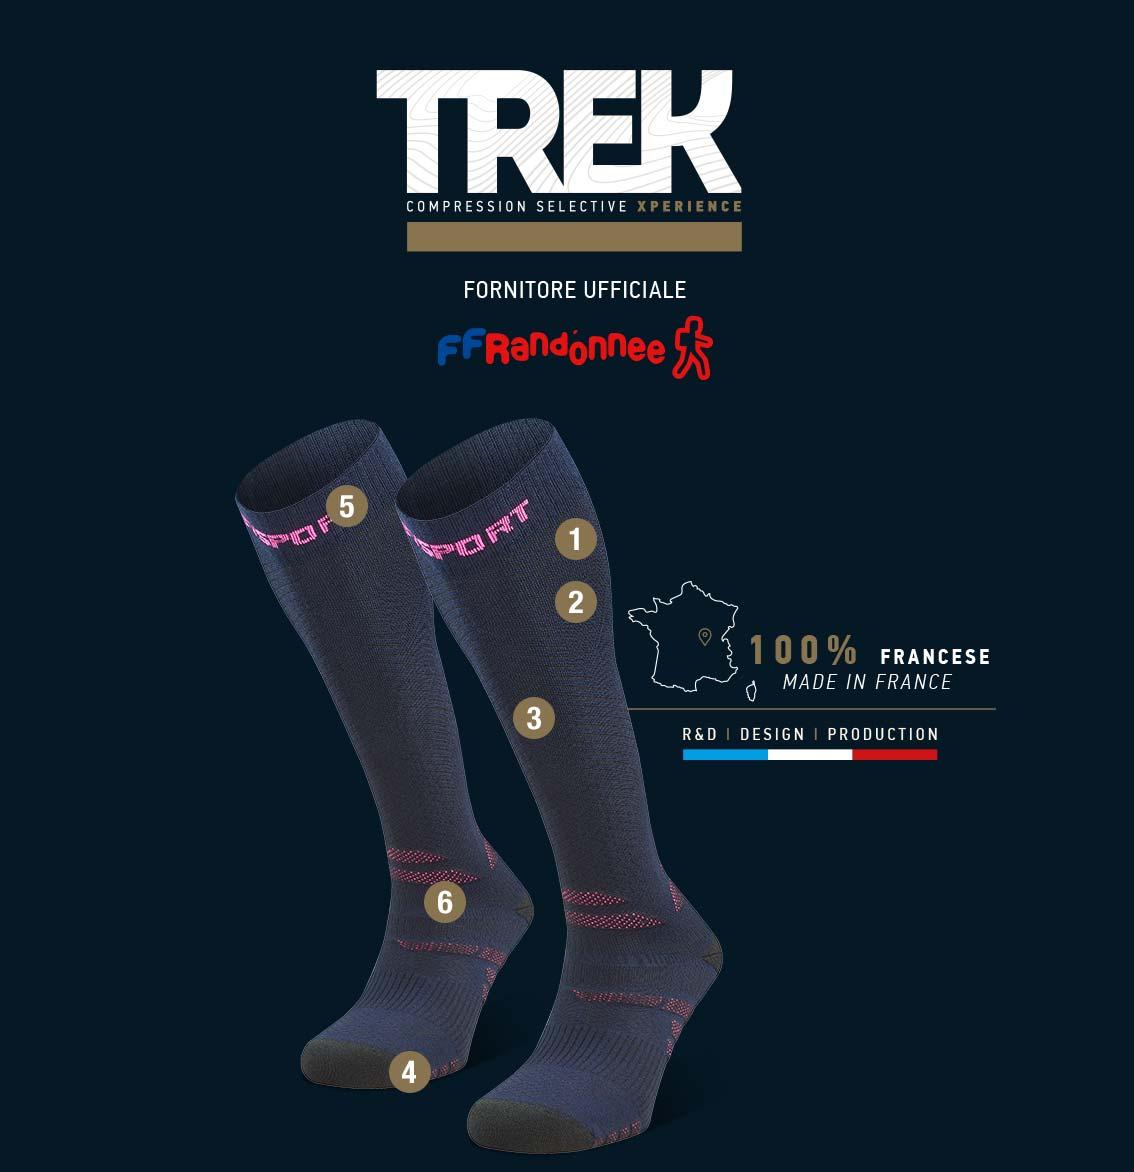 Calza_da_trekking_Trek_compression_EVO_blu-rosa